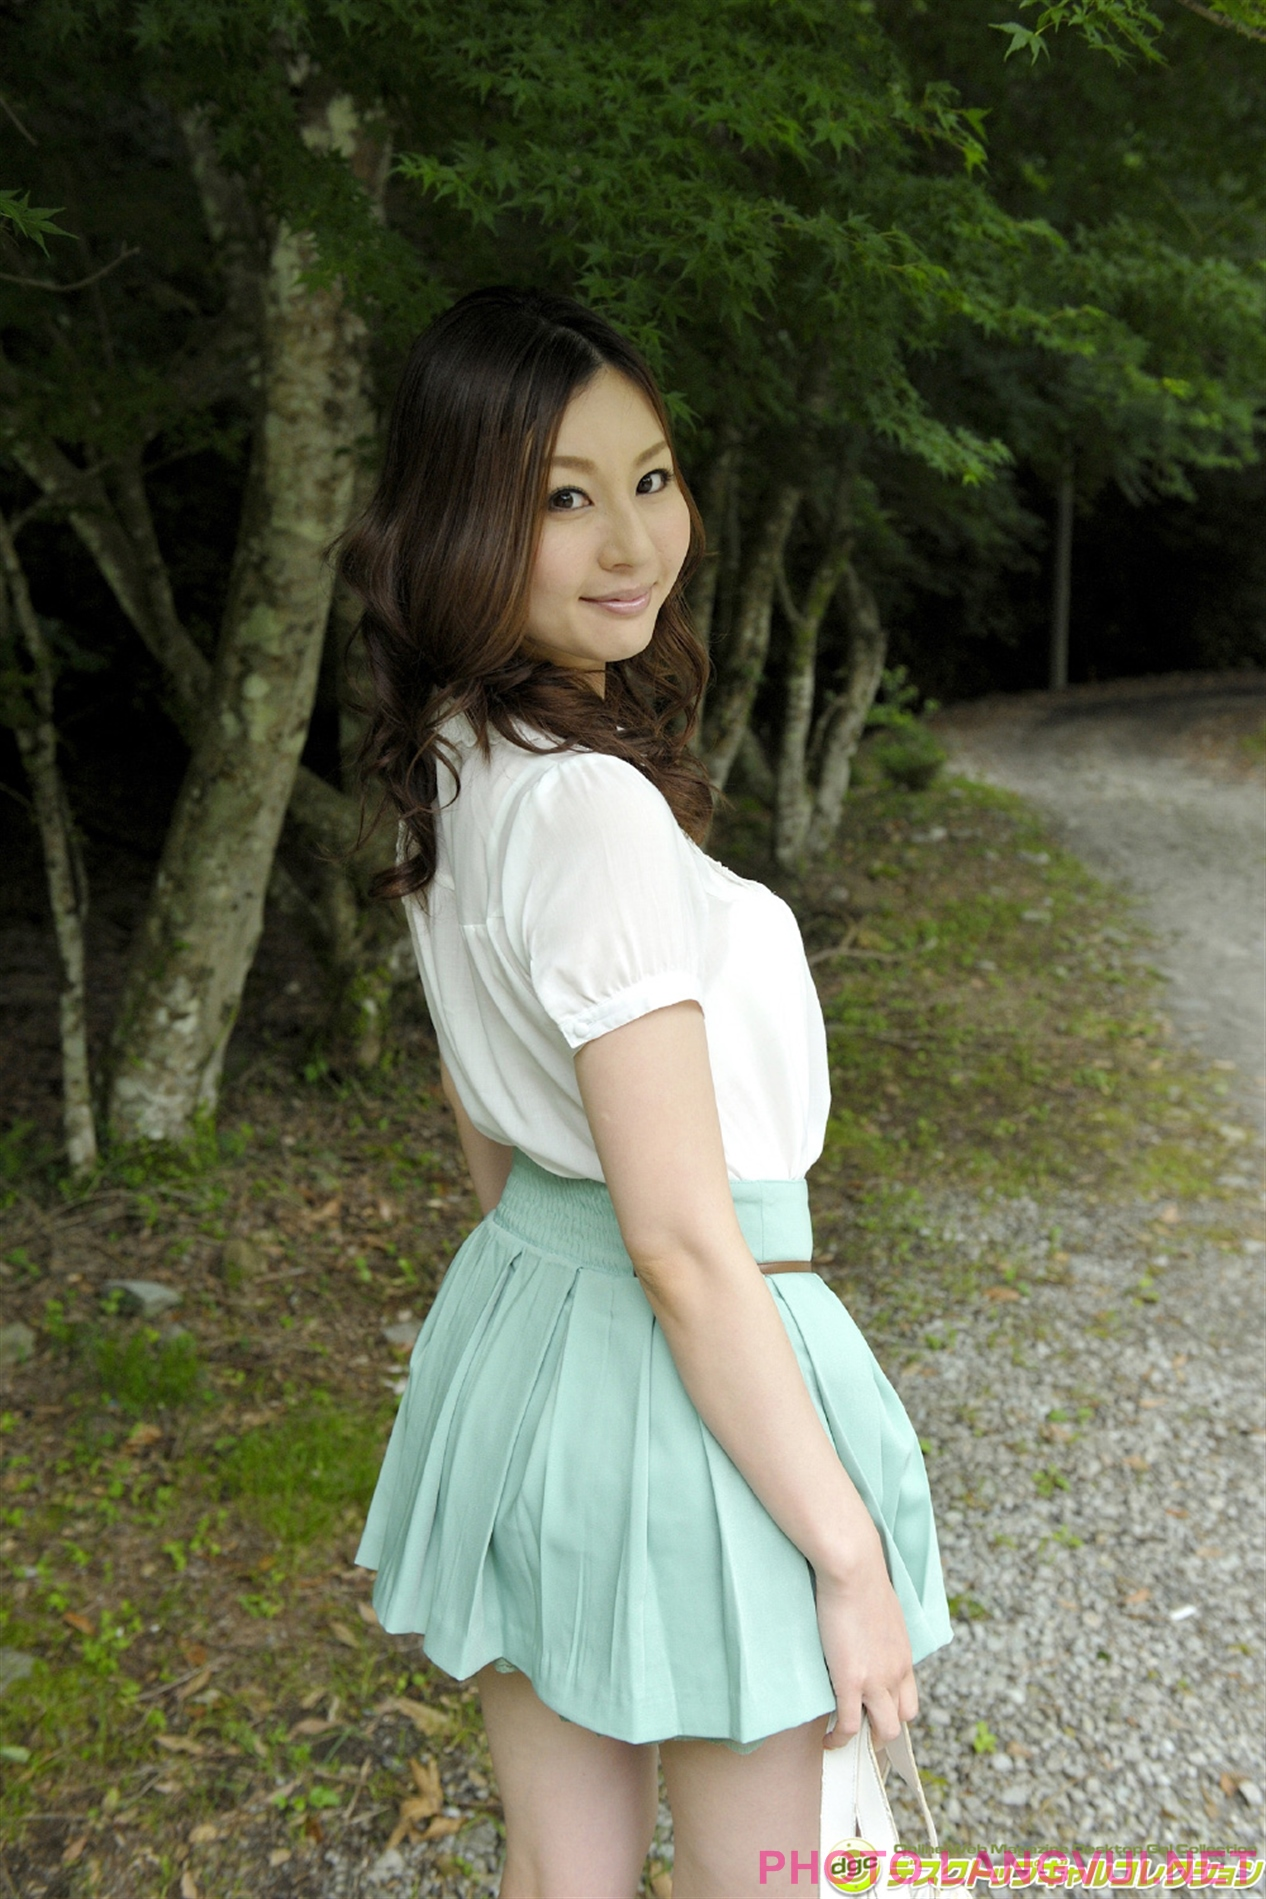 DGC No 1213 Yui Tatsumi - Page 2 of 11 - Ảnh Girl Xinh